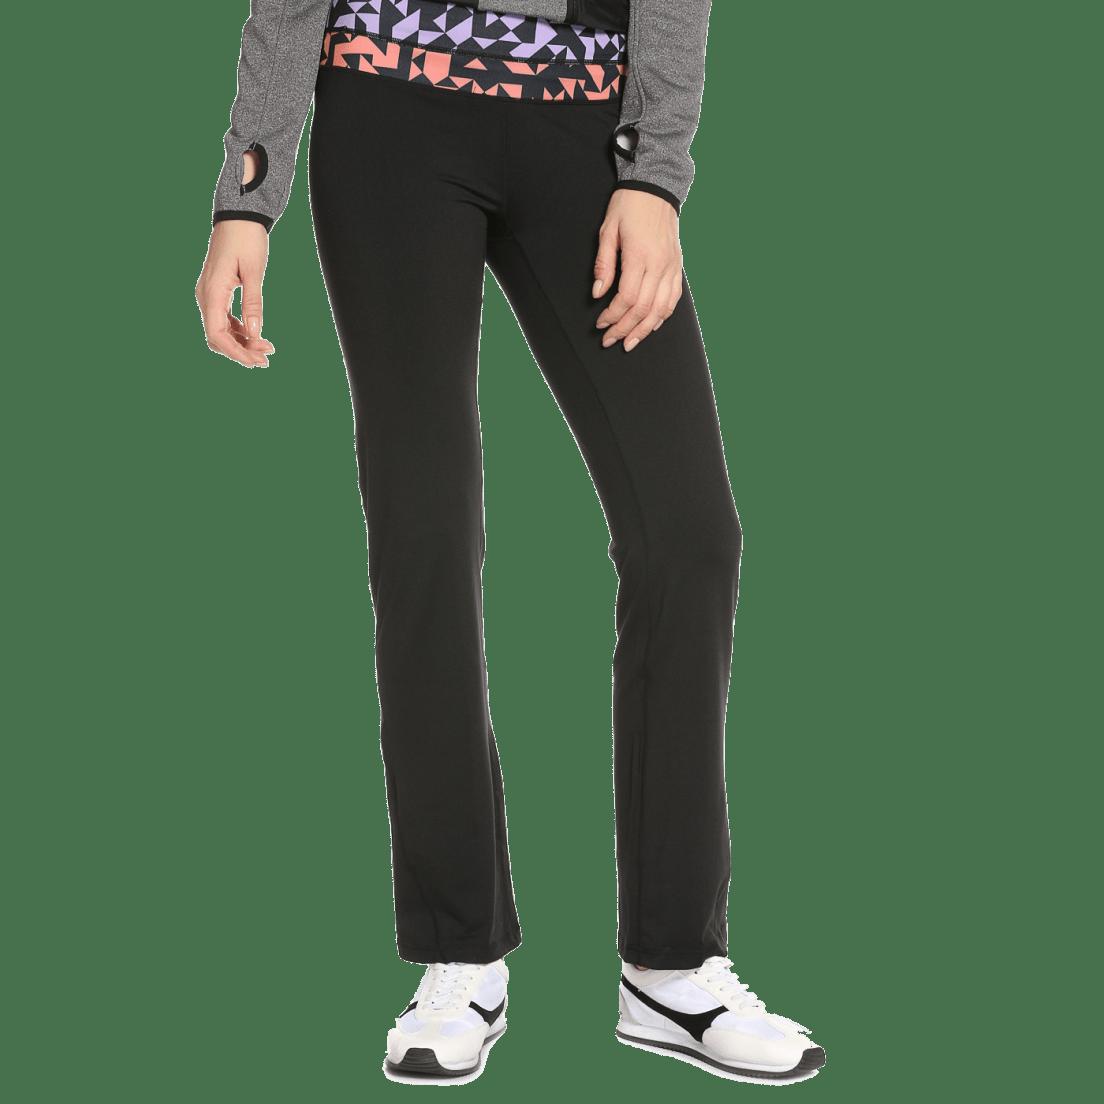 Reebok Women s Strength Geo Print Pants + Bonus Activity Tracker (NEED TO  DELETE b1a321c67